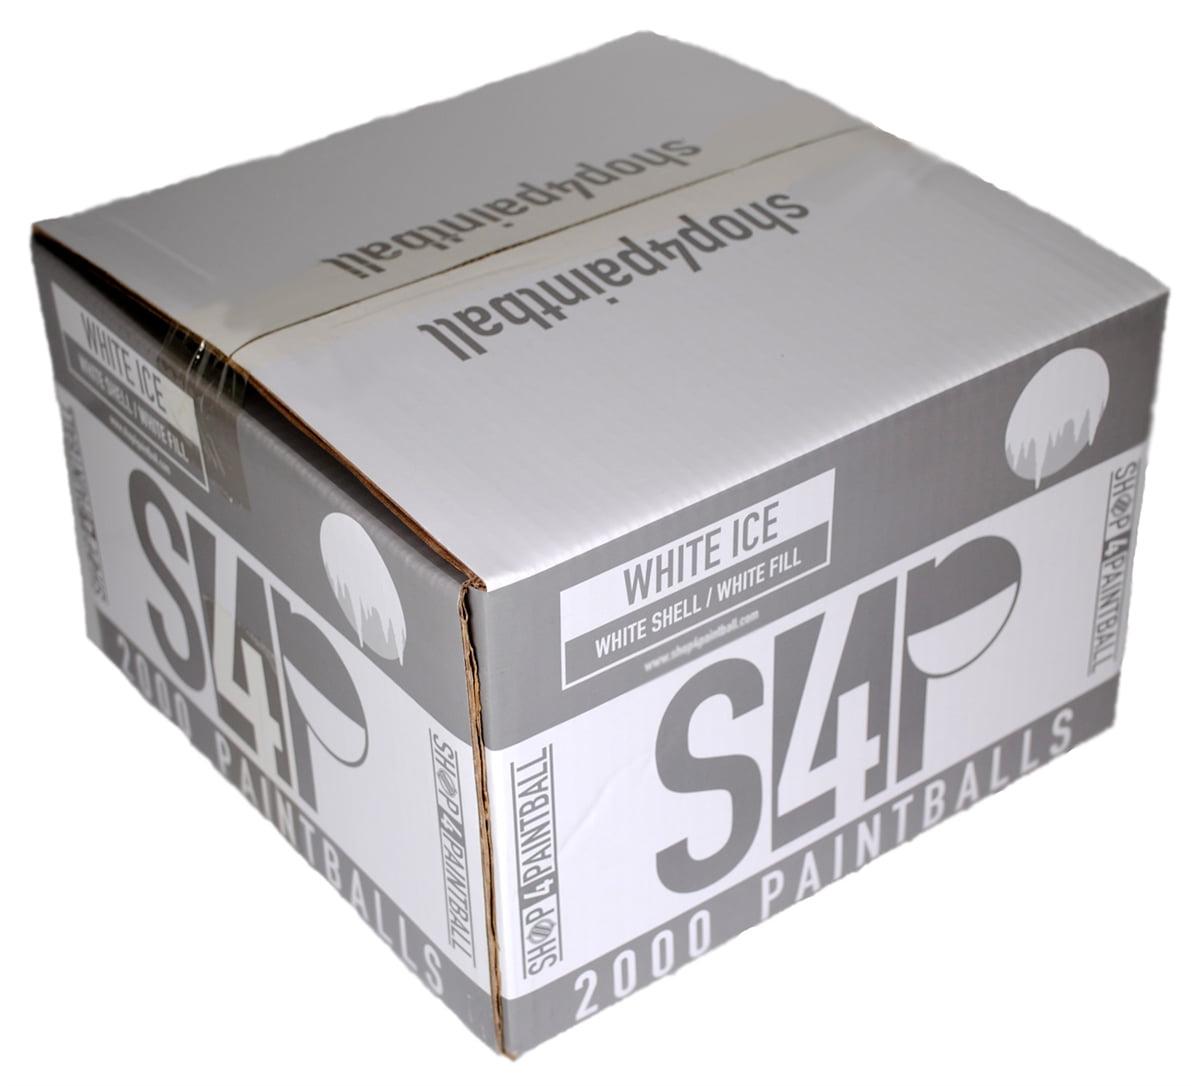 Shop4Paintball - WHITE ICE - .68 Caliber Paintballs - White/White - Case of 2000